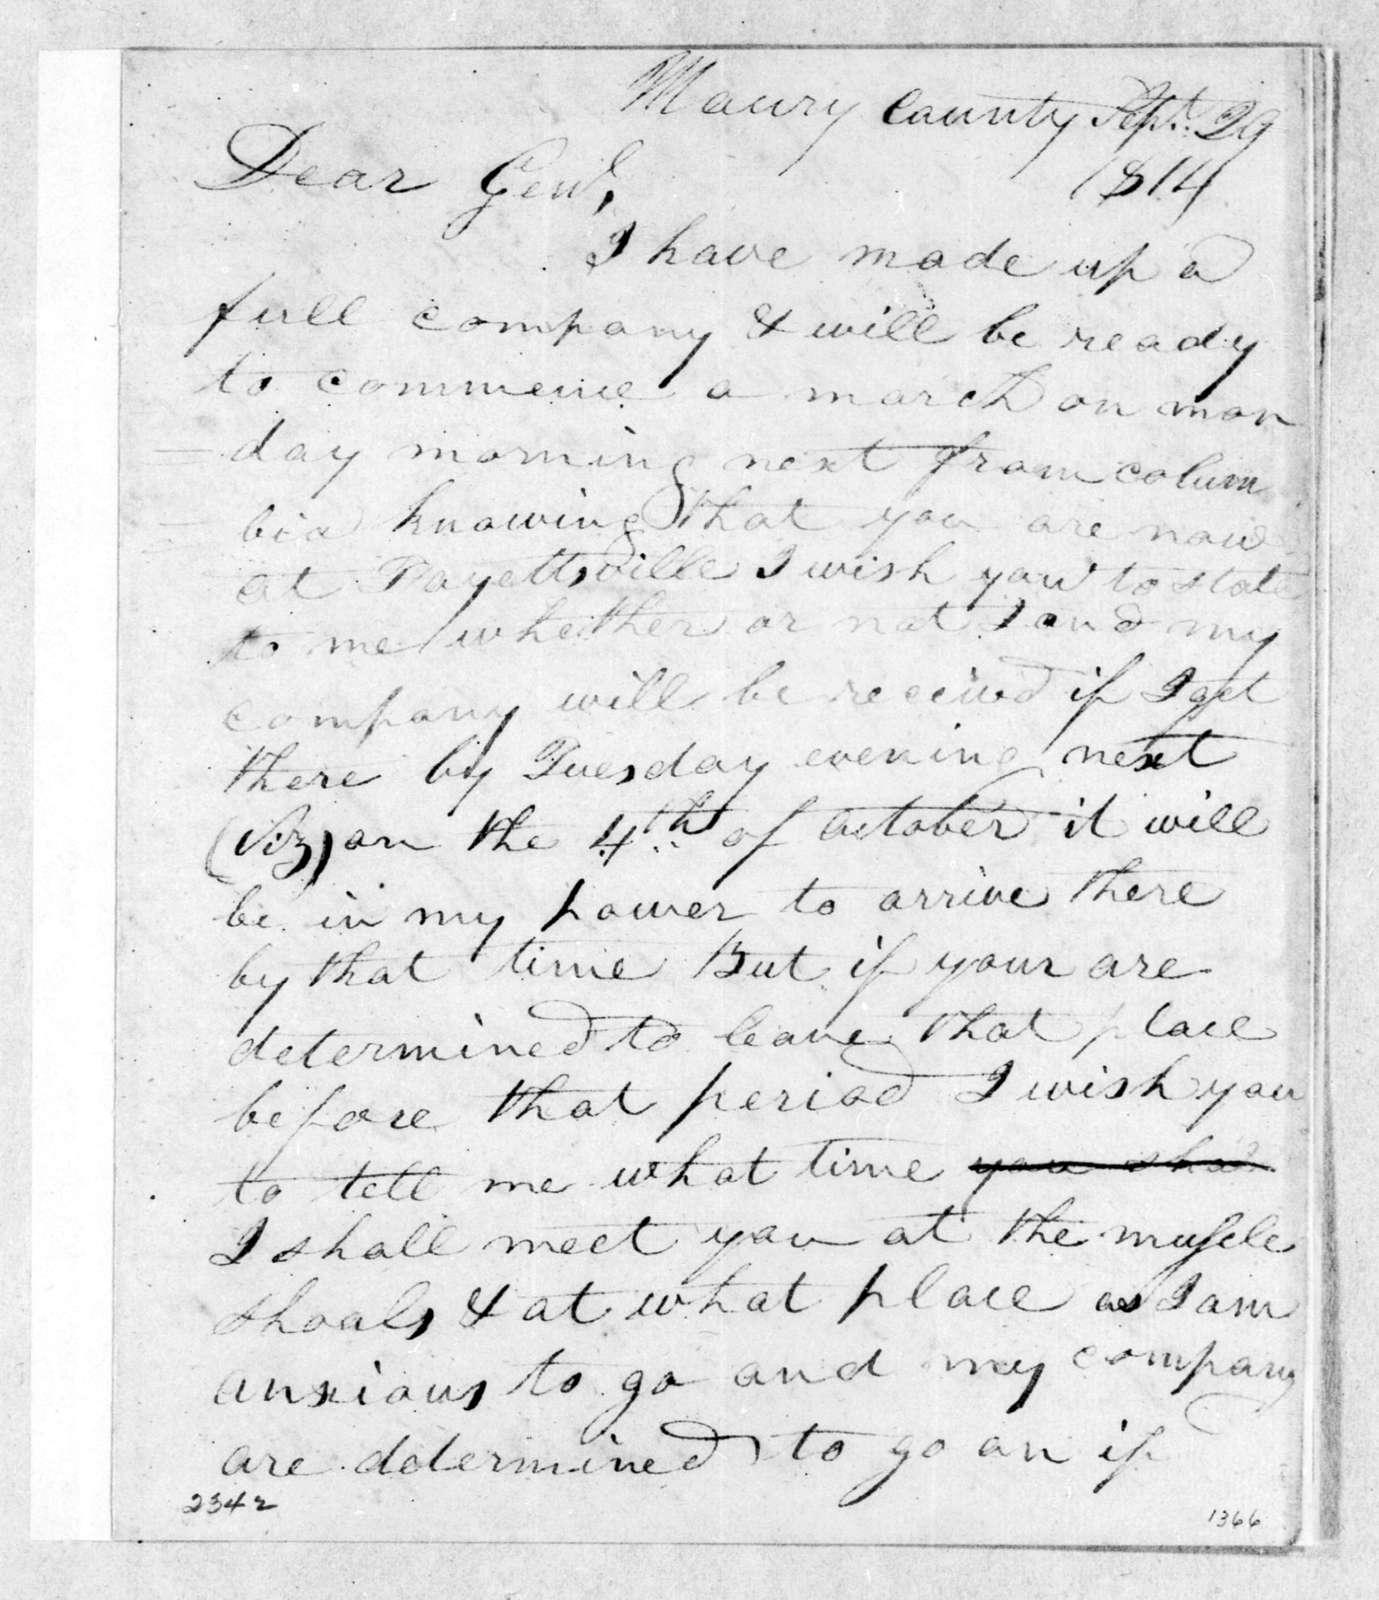 James W. Mahon to John Coffee, September 29, 1814